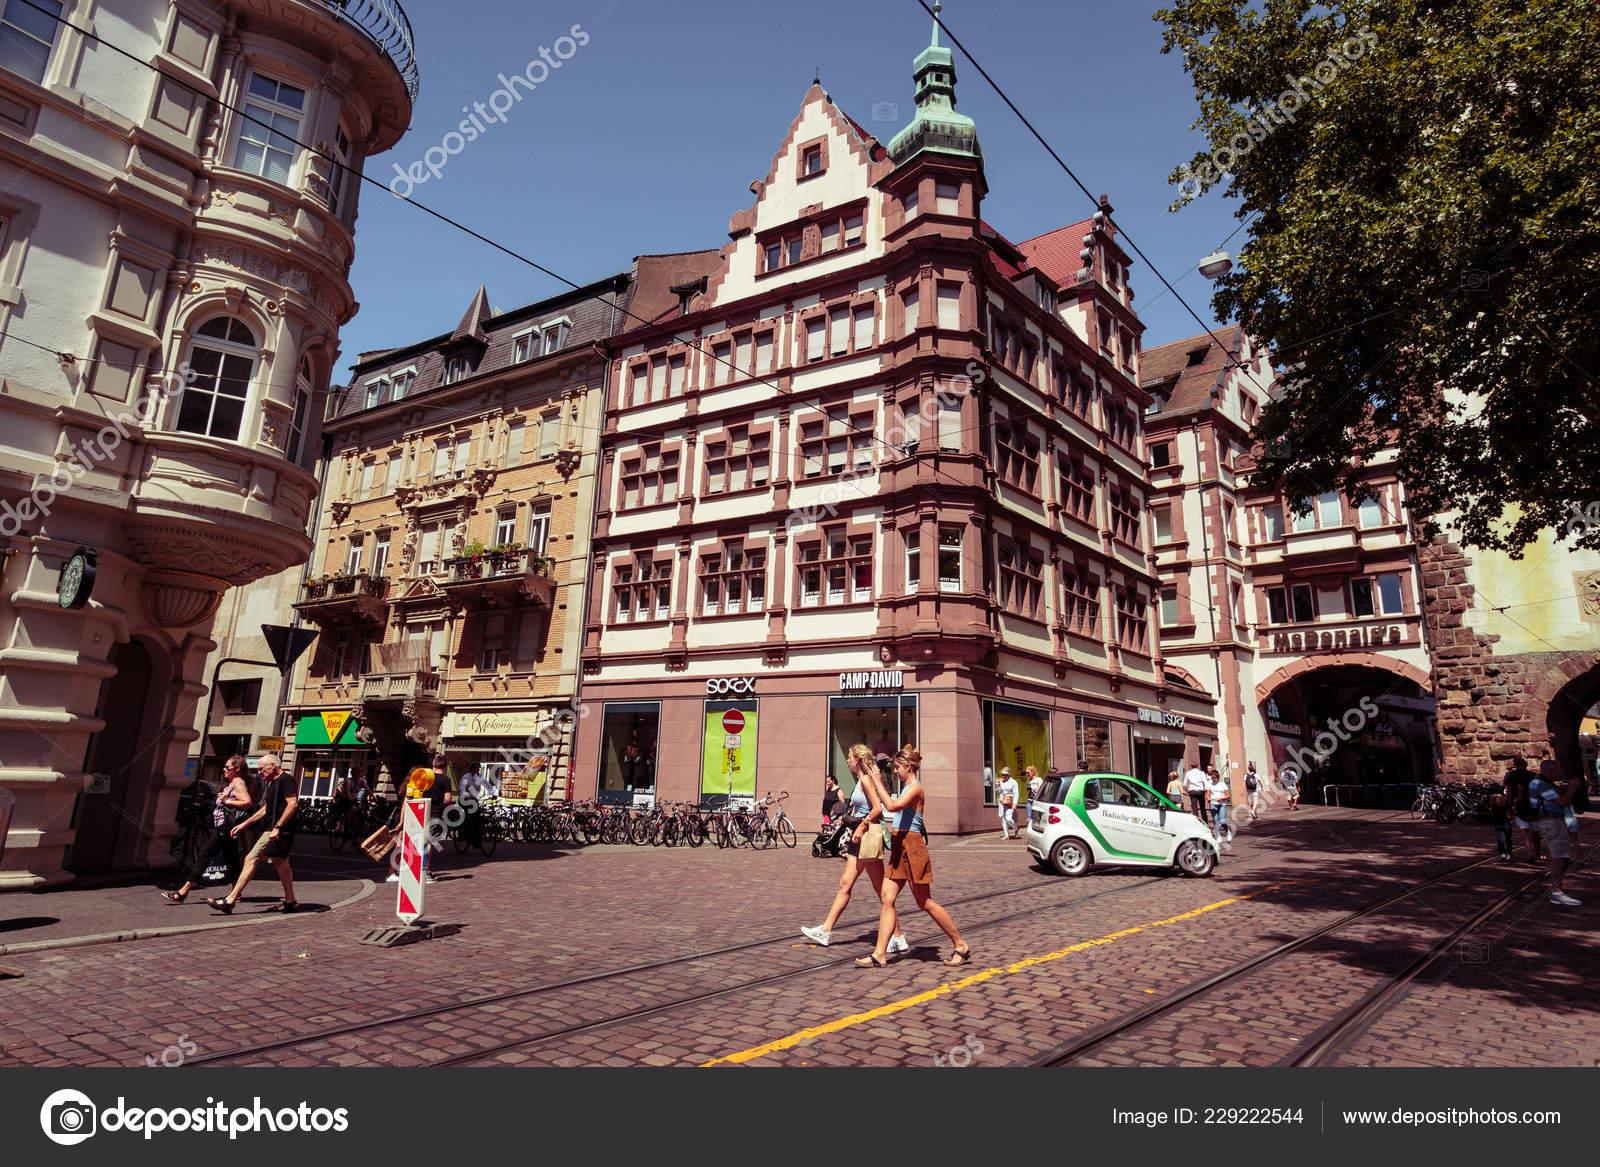 Freiburg Breisgau Baden Wurttemberg Germany July 2018